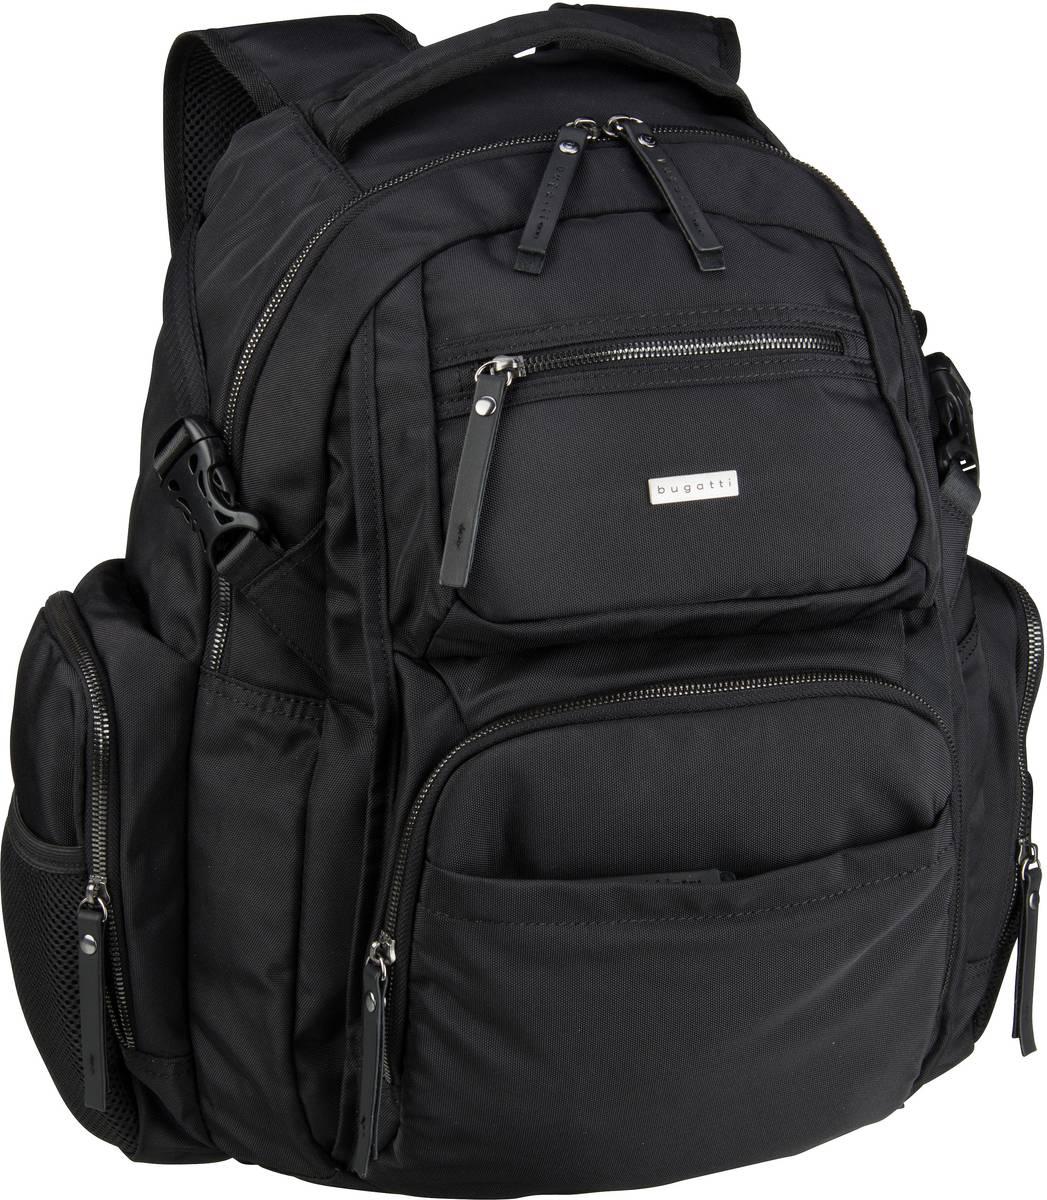 Laptoprucksack Contratempo Backpack Big Schwarz